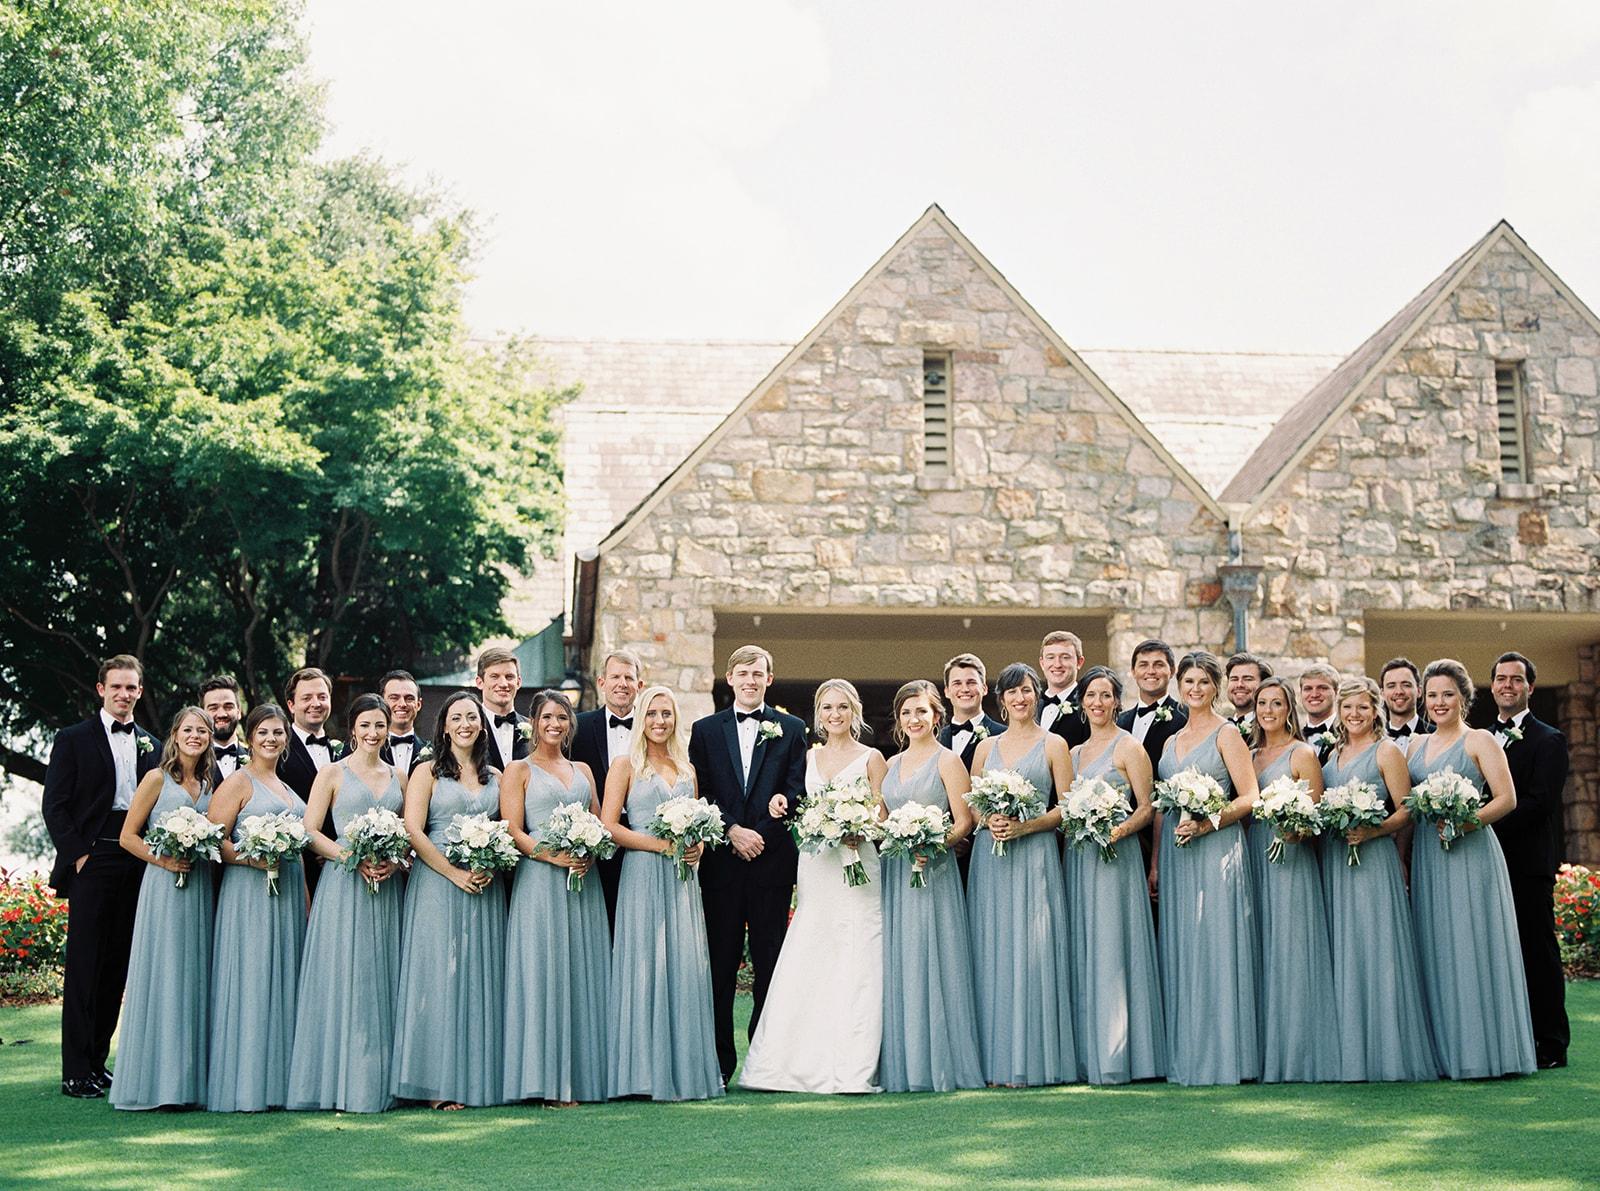 Wedding party | Birmingham, Alabama wedding | Taylor Dane Photography | Custom wedding invitations by Little Fox Paperie | Gracie Nunez